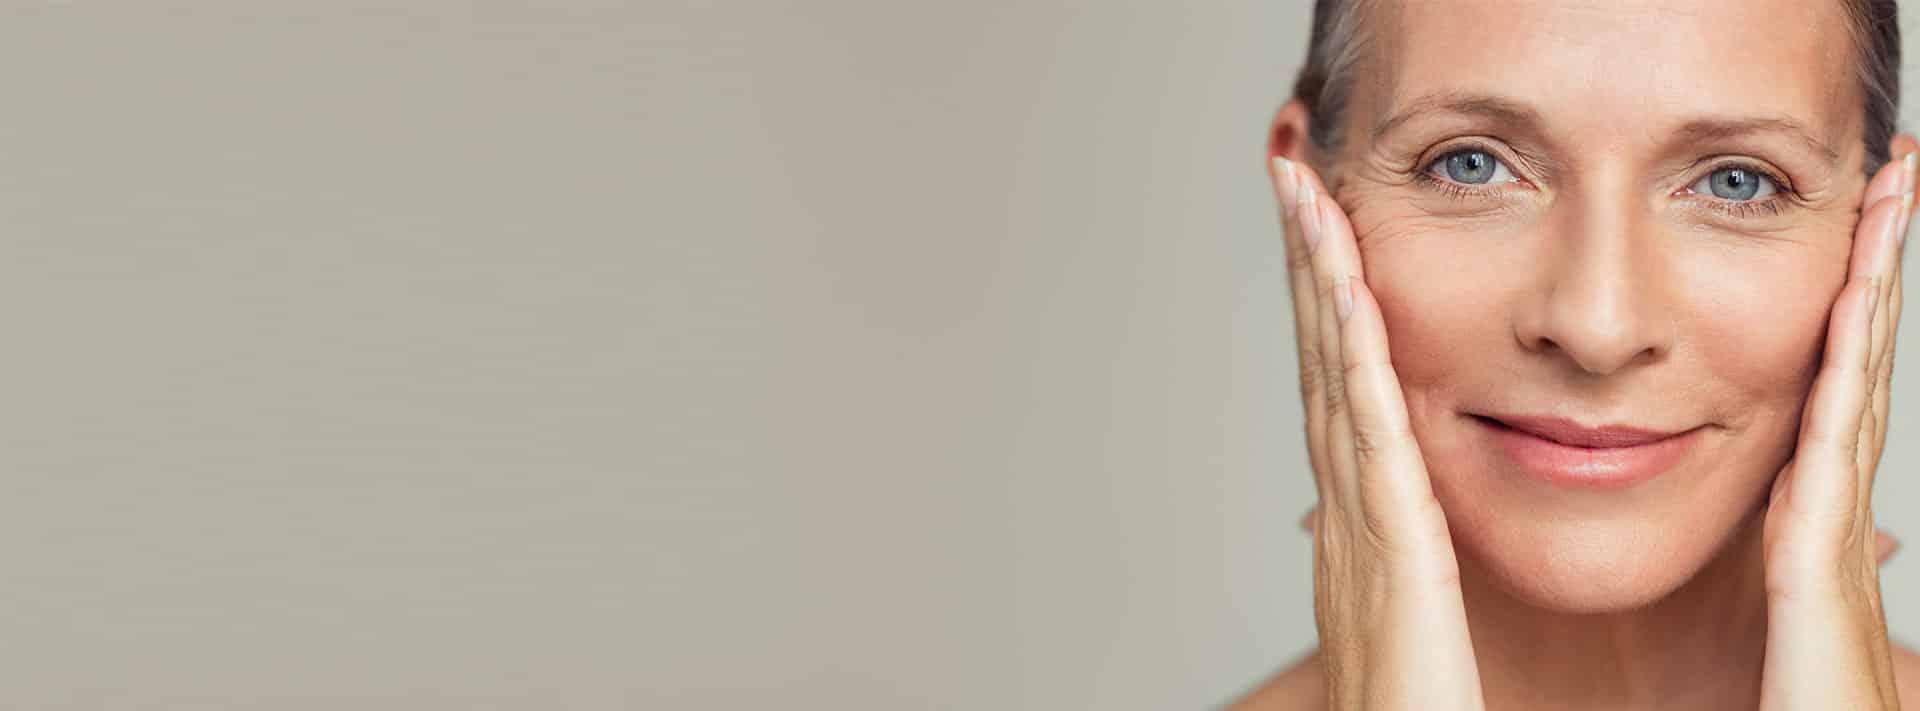 LCIAD Face facial aesthetics homepage slider 2